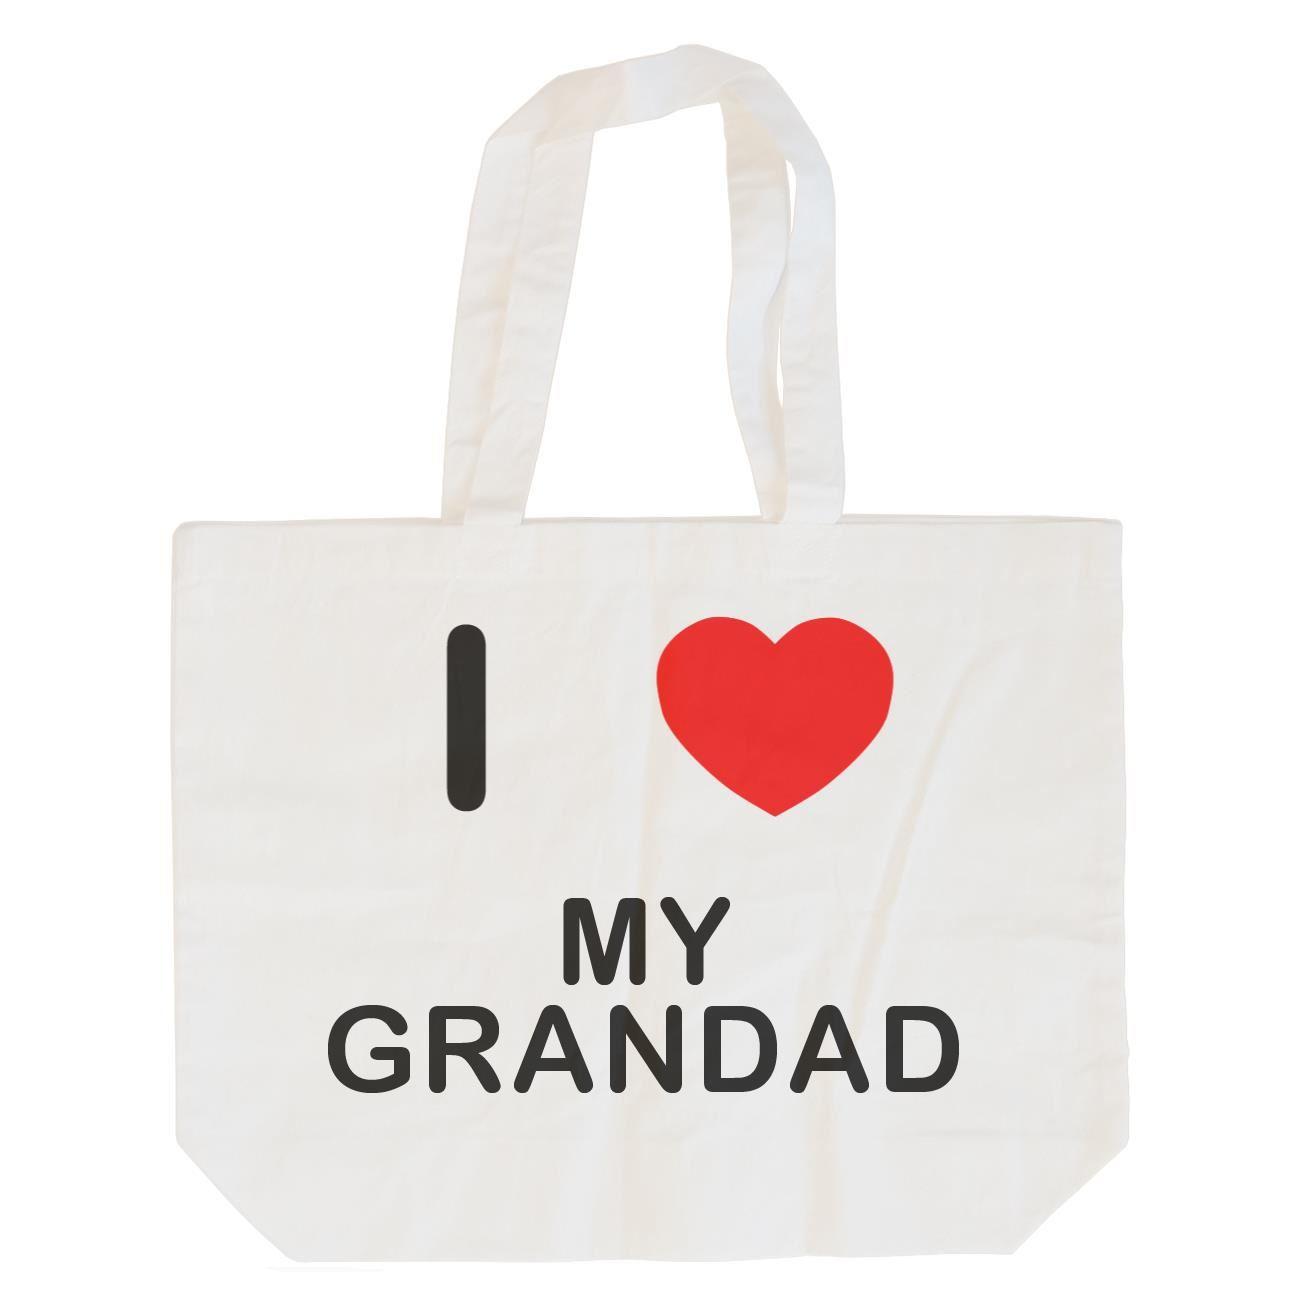 I Love My Grandad - Cotton Bag | Size choice Tote, Shopper or Sling